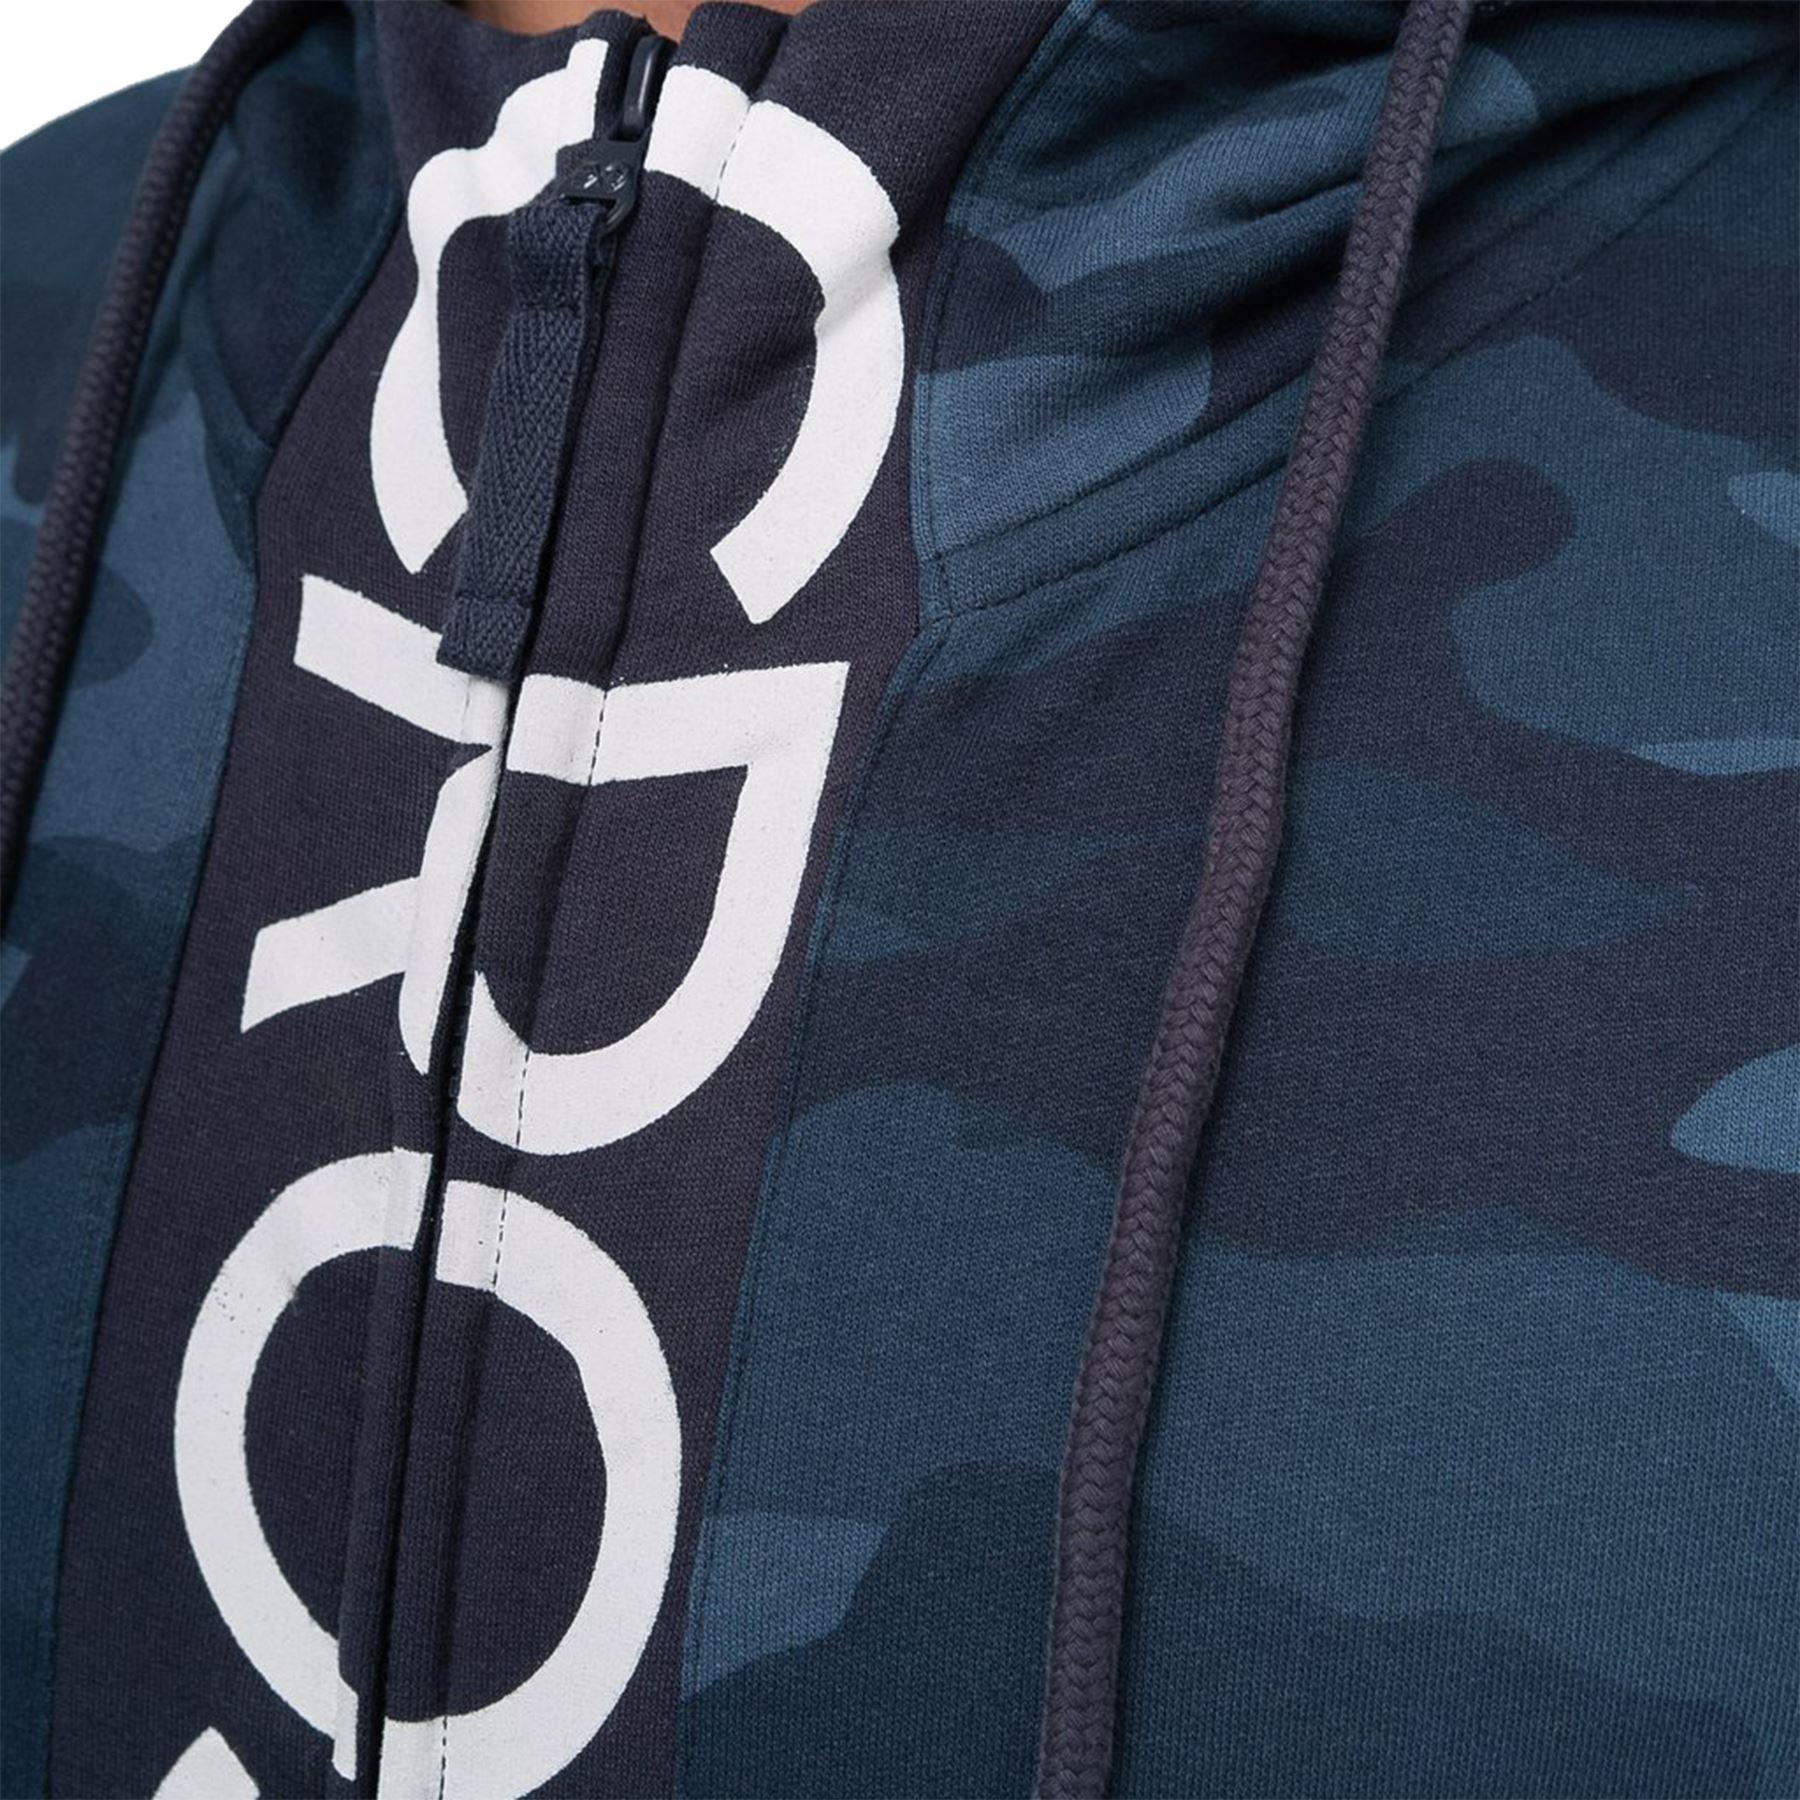 Crosshatch-Mens-Camo-Hoodie-Designer-Army-Style-Jacket-Zip-Thru-Pocket-Jacket thumbnail 4